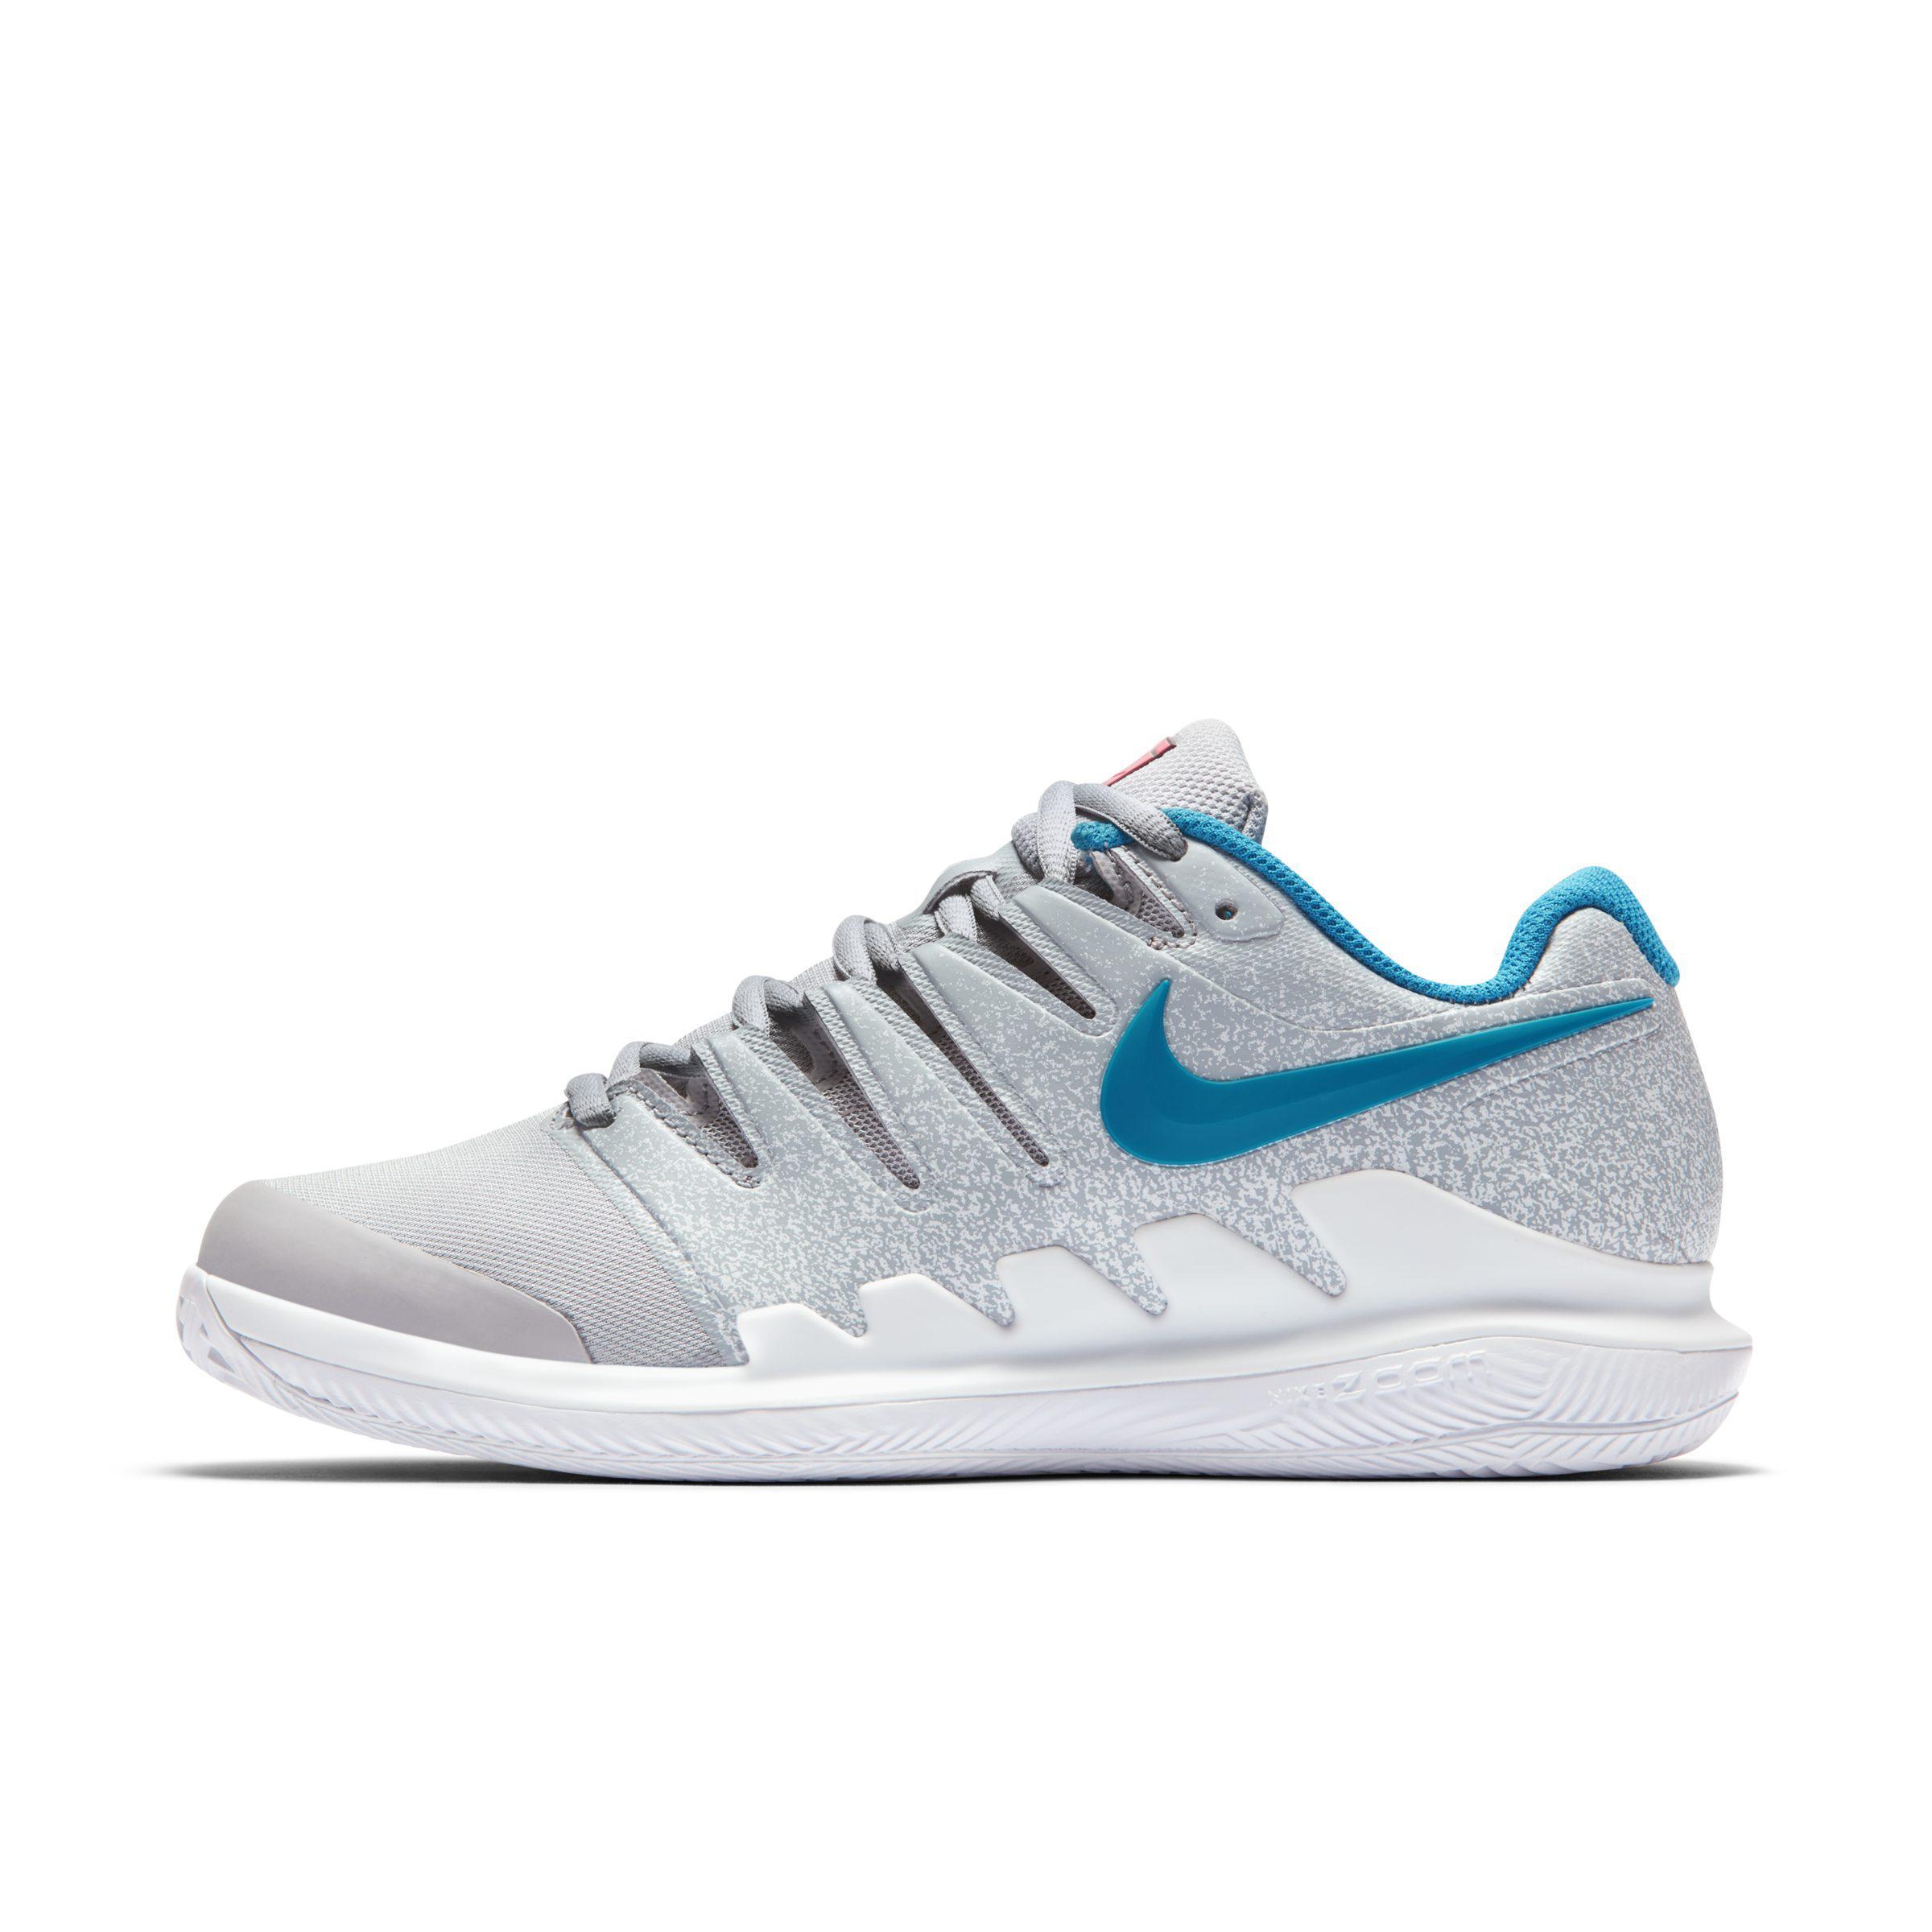 0433995845042 Nike Air Zoom Vapor X Clay Tennis Shoe in Gray - Lyst